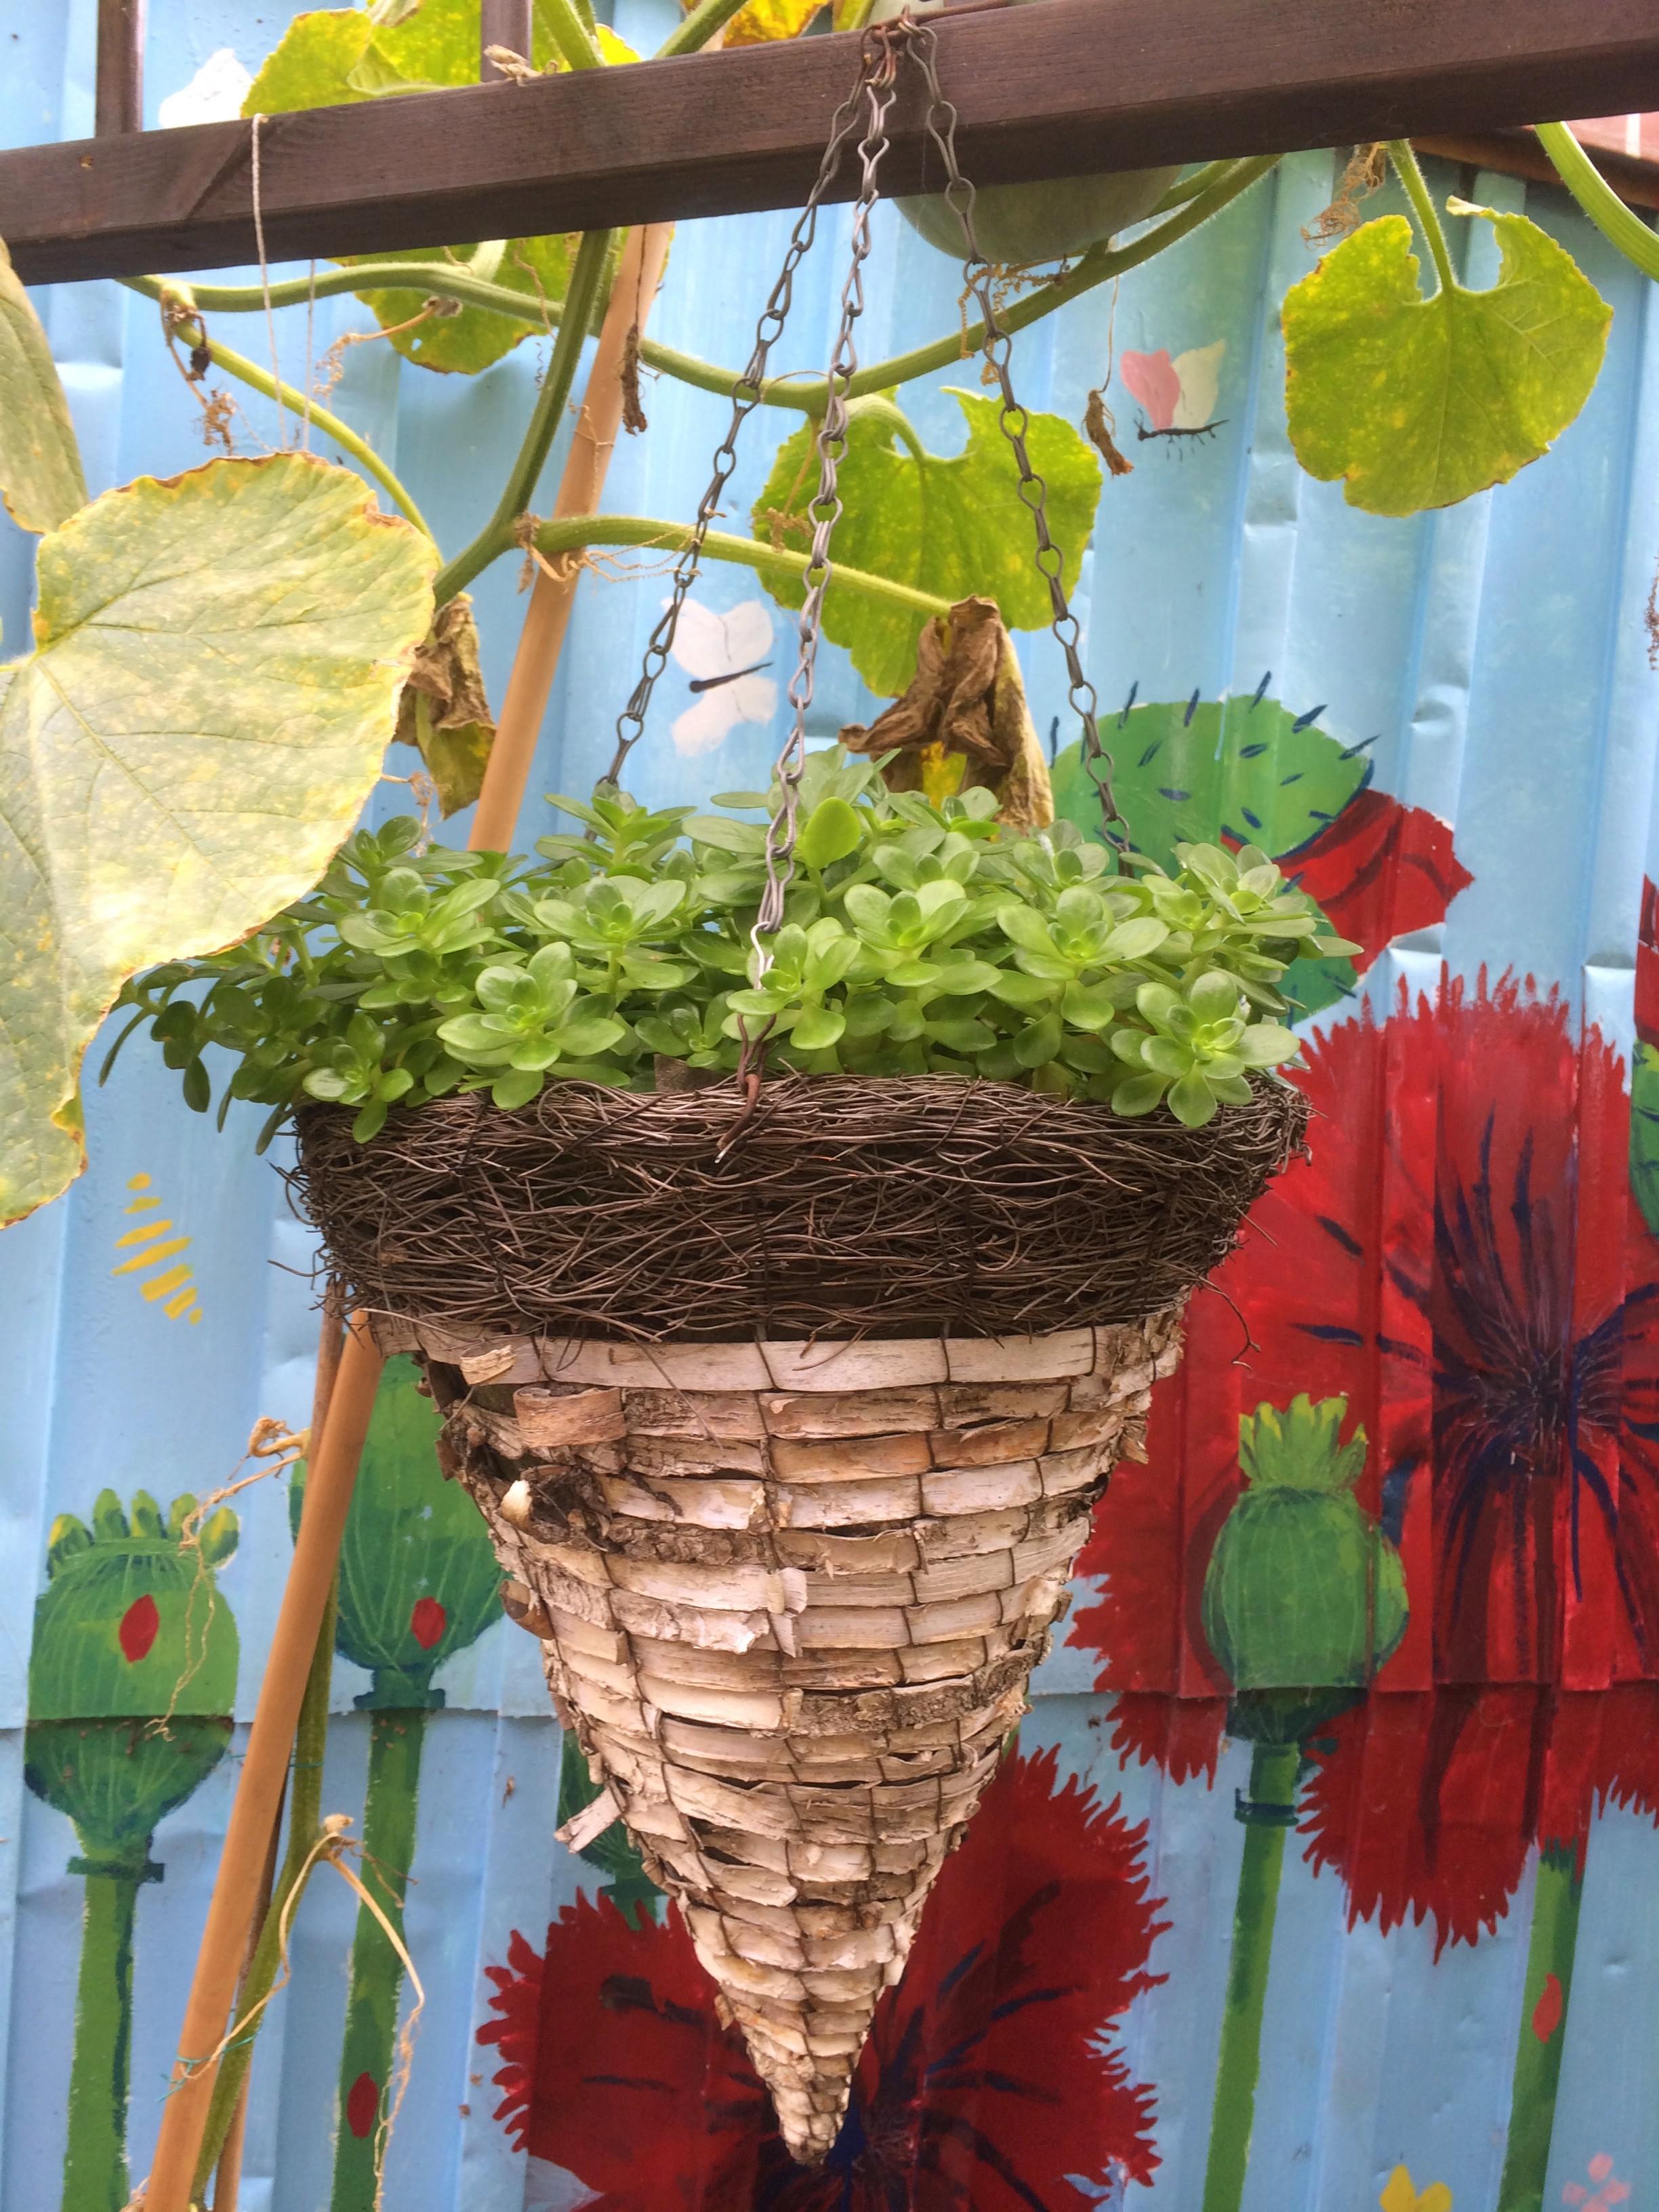 Hanging Flower Baskets Cone Shaped : Cranbrook community food garden